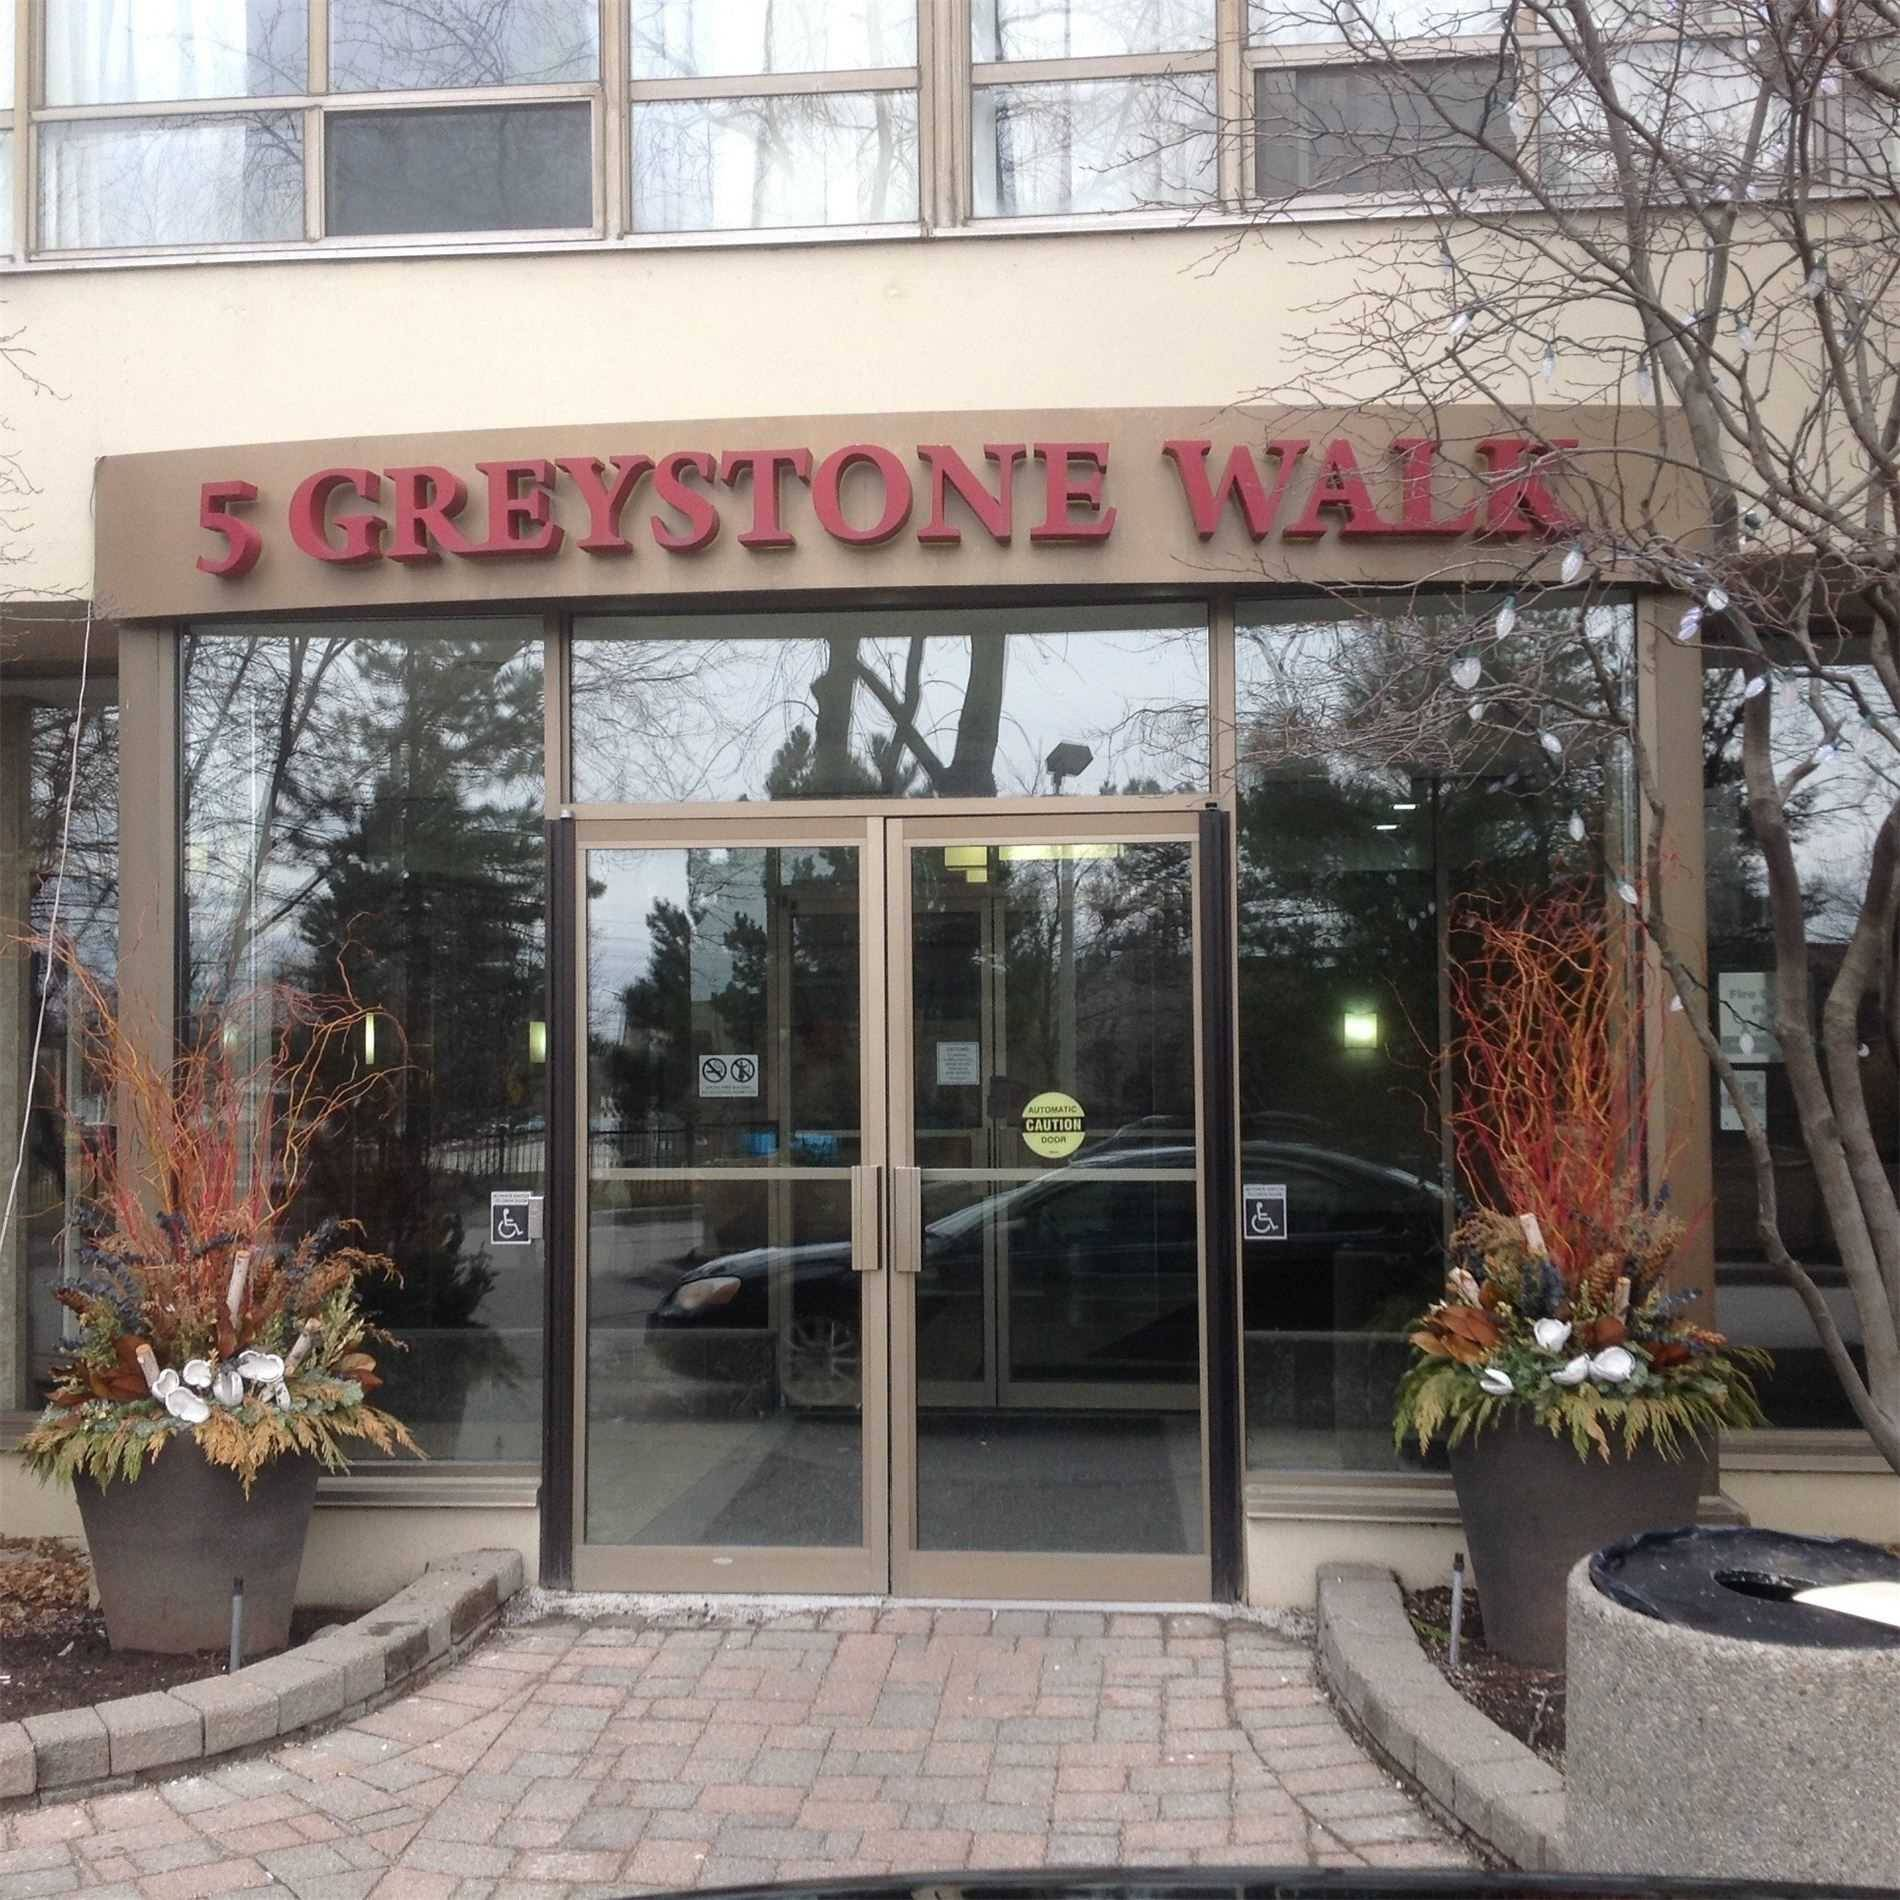 Greystone Walk Condos: 5 Greystone Walk Drive, Toronto, ON